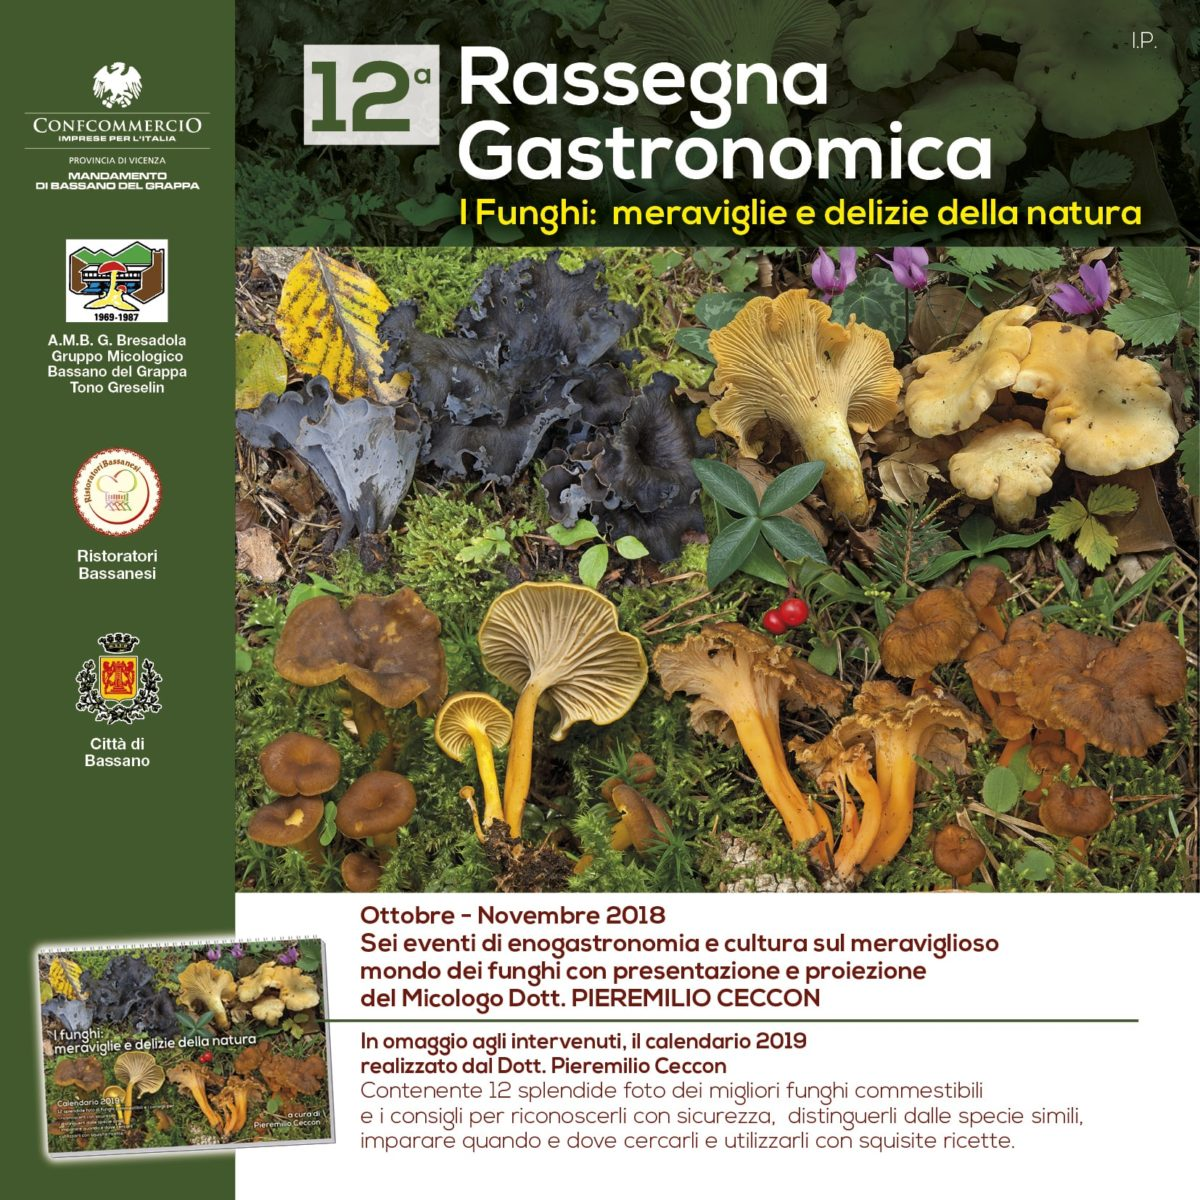 Rassegna funghi Ristoratori Bassanesi